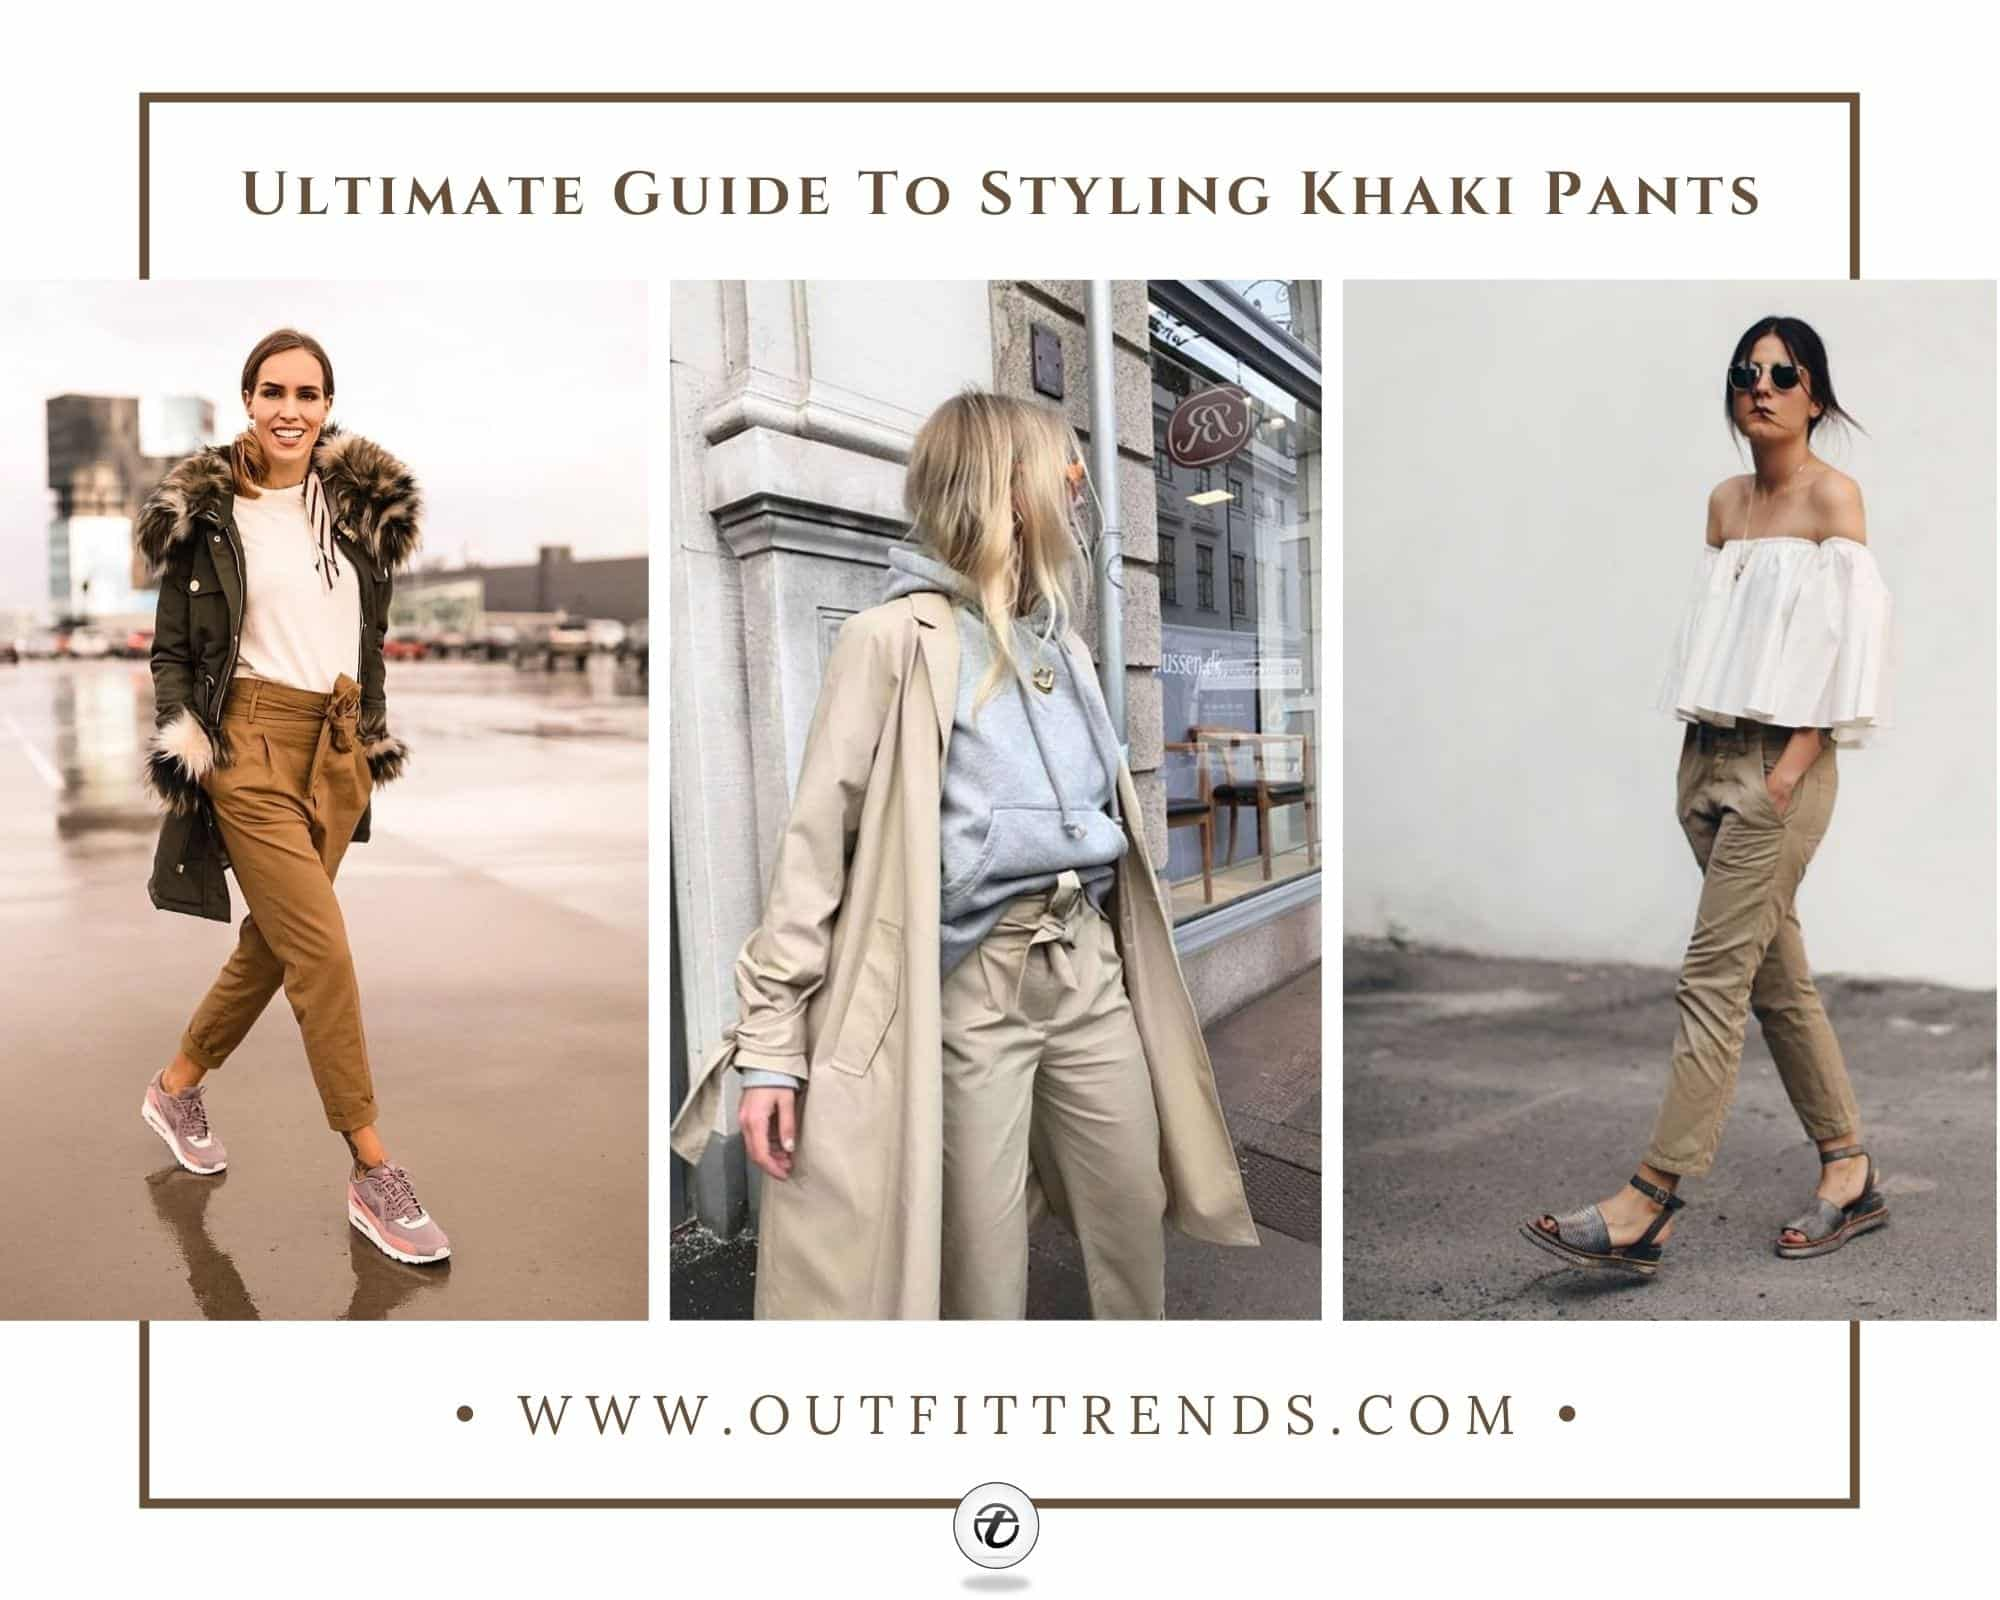 Khaki Pant Outfits for Women | 22 Ways to Wear Khaki Pants